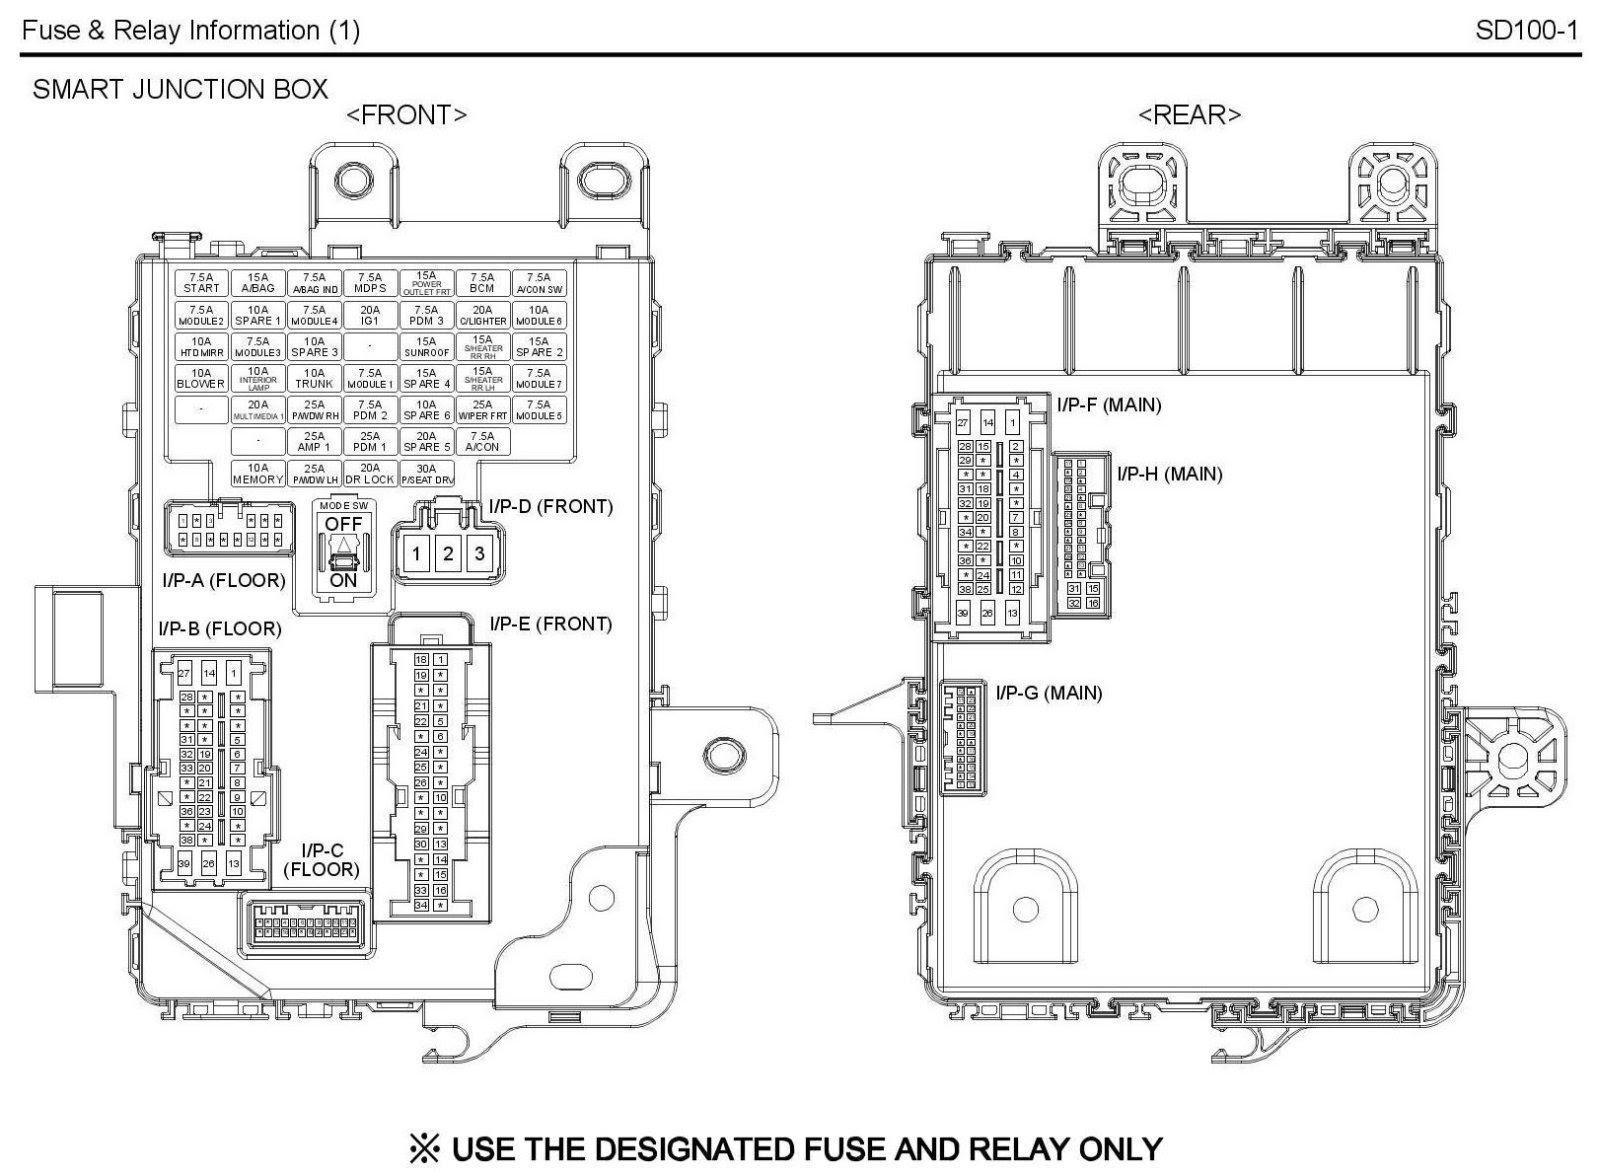 Wiring Diagram PDF: 2002 Hyundai Xg350 Fuse Box Diagram